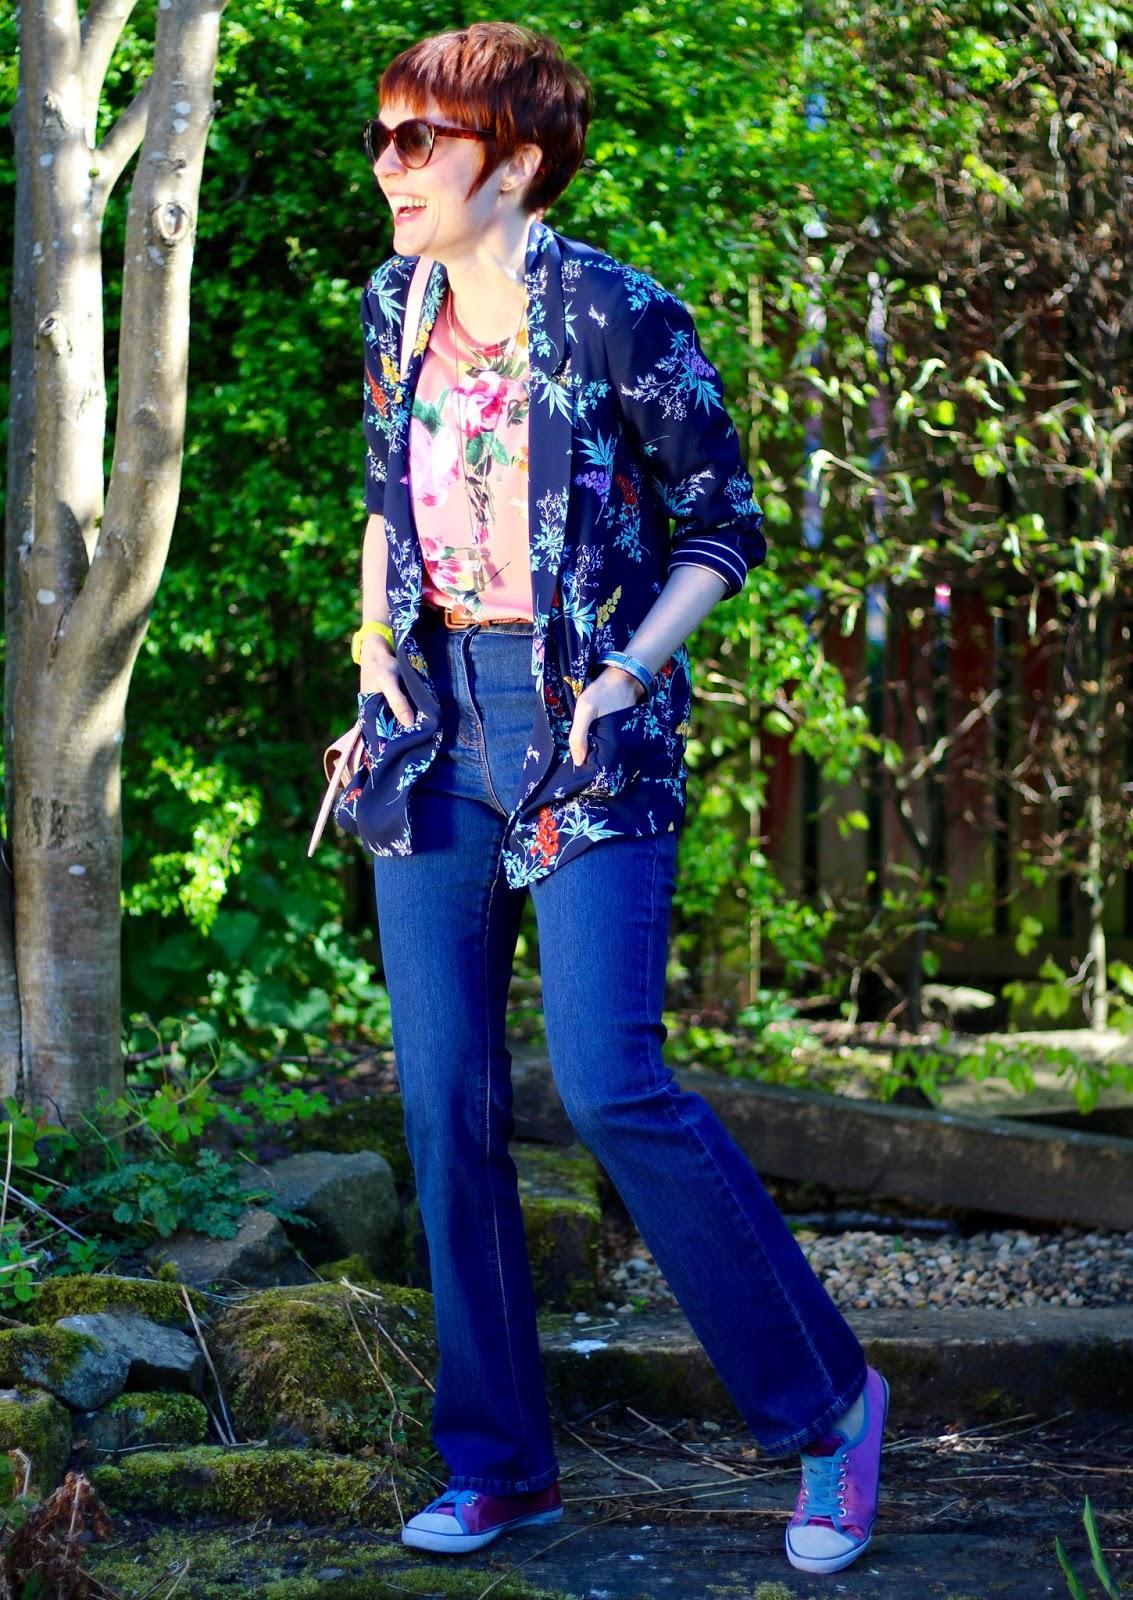 Mixing Florals | Pink Floral blouse, Navy Blazer & Bootcut Jeans | Bonmarché